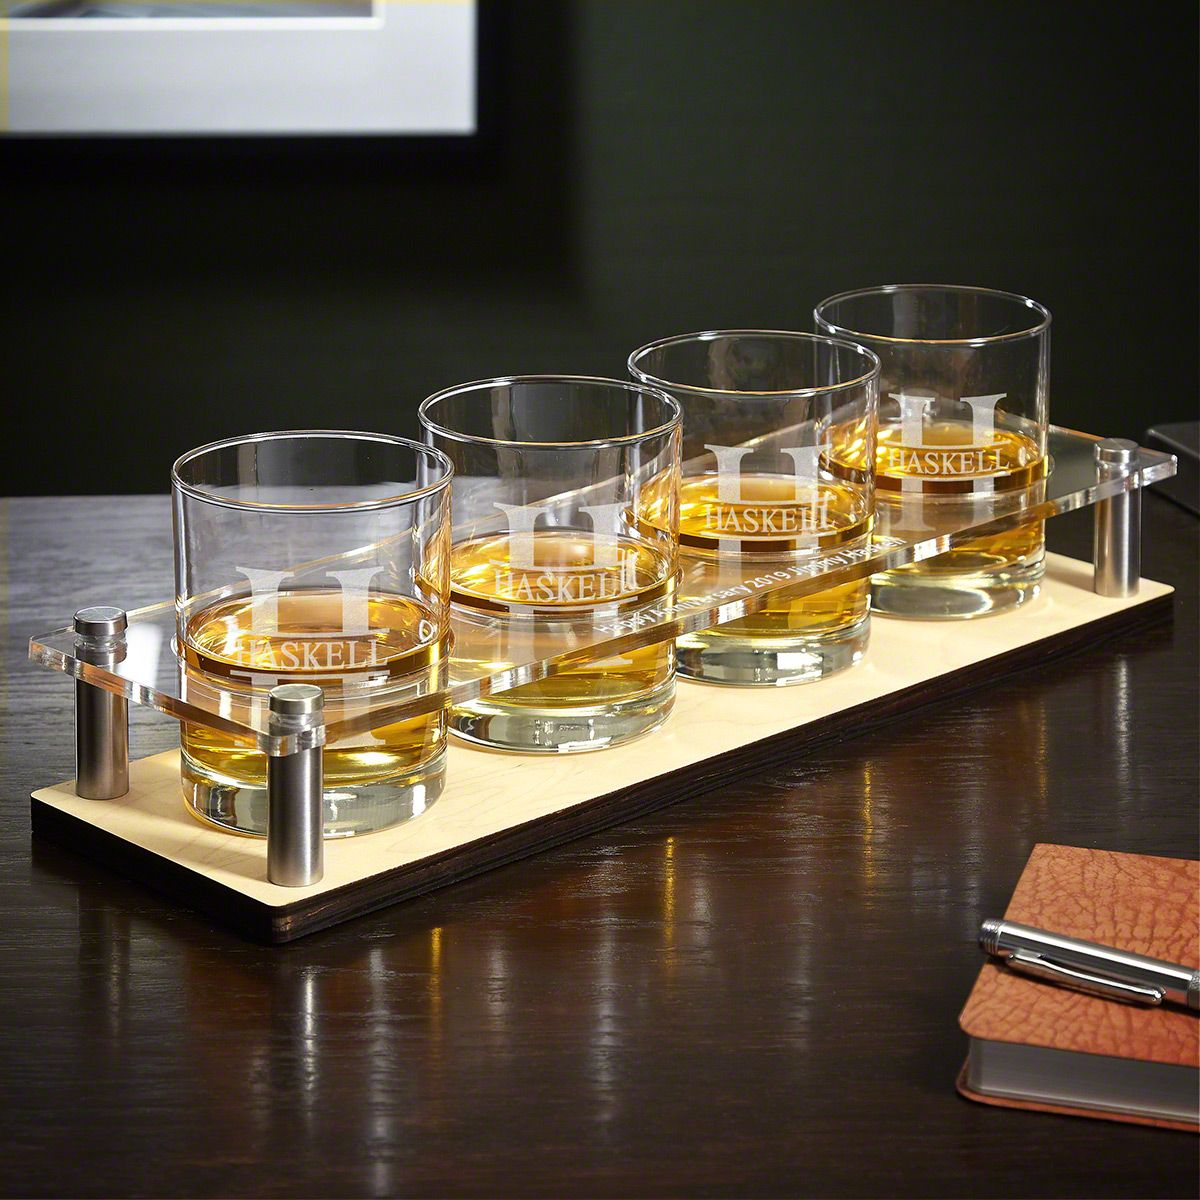 Oakmont Engraved Presentation Set with Whiskey Glasses 5 pc